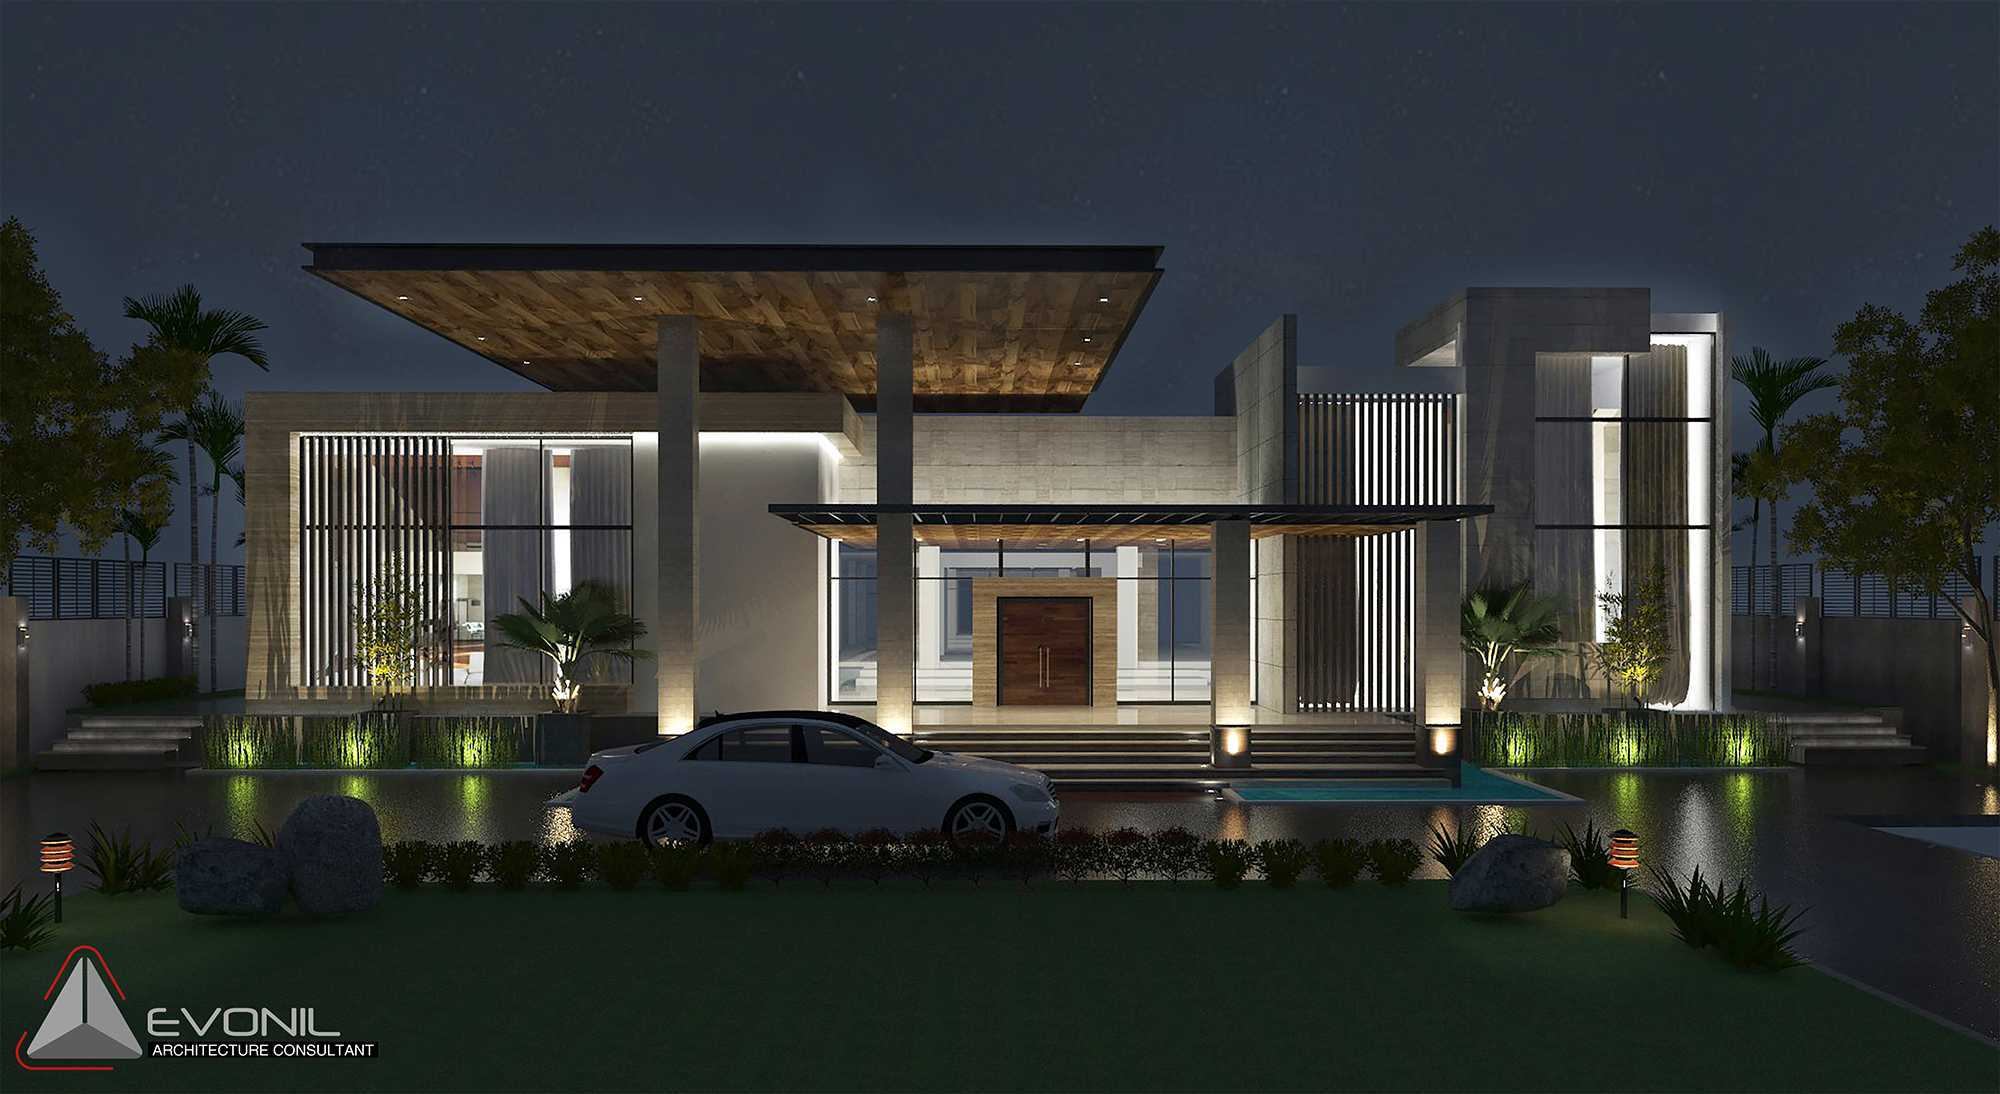 Evonil Architecture Residence Pangkalan Bun Pangkalan Bun, Kalimantan, Indonesia Pangkalan Bun, Kalimantan, Indonesia Pool-View-Residence-Pangkalan-Bun Modern  13152